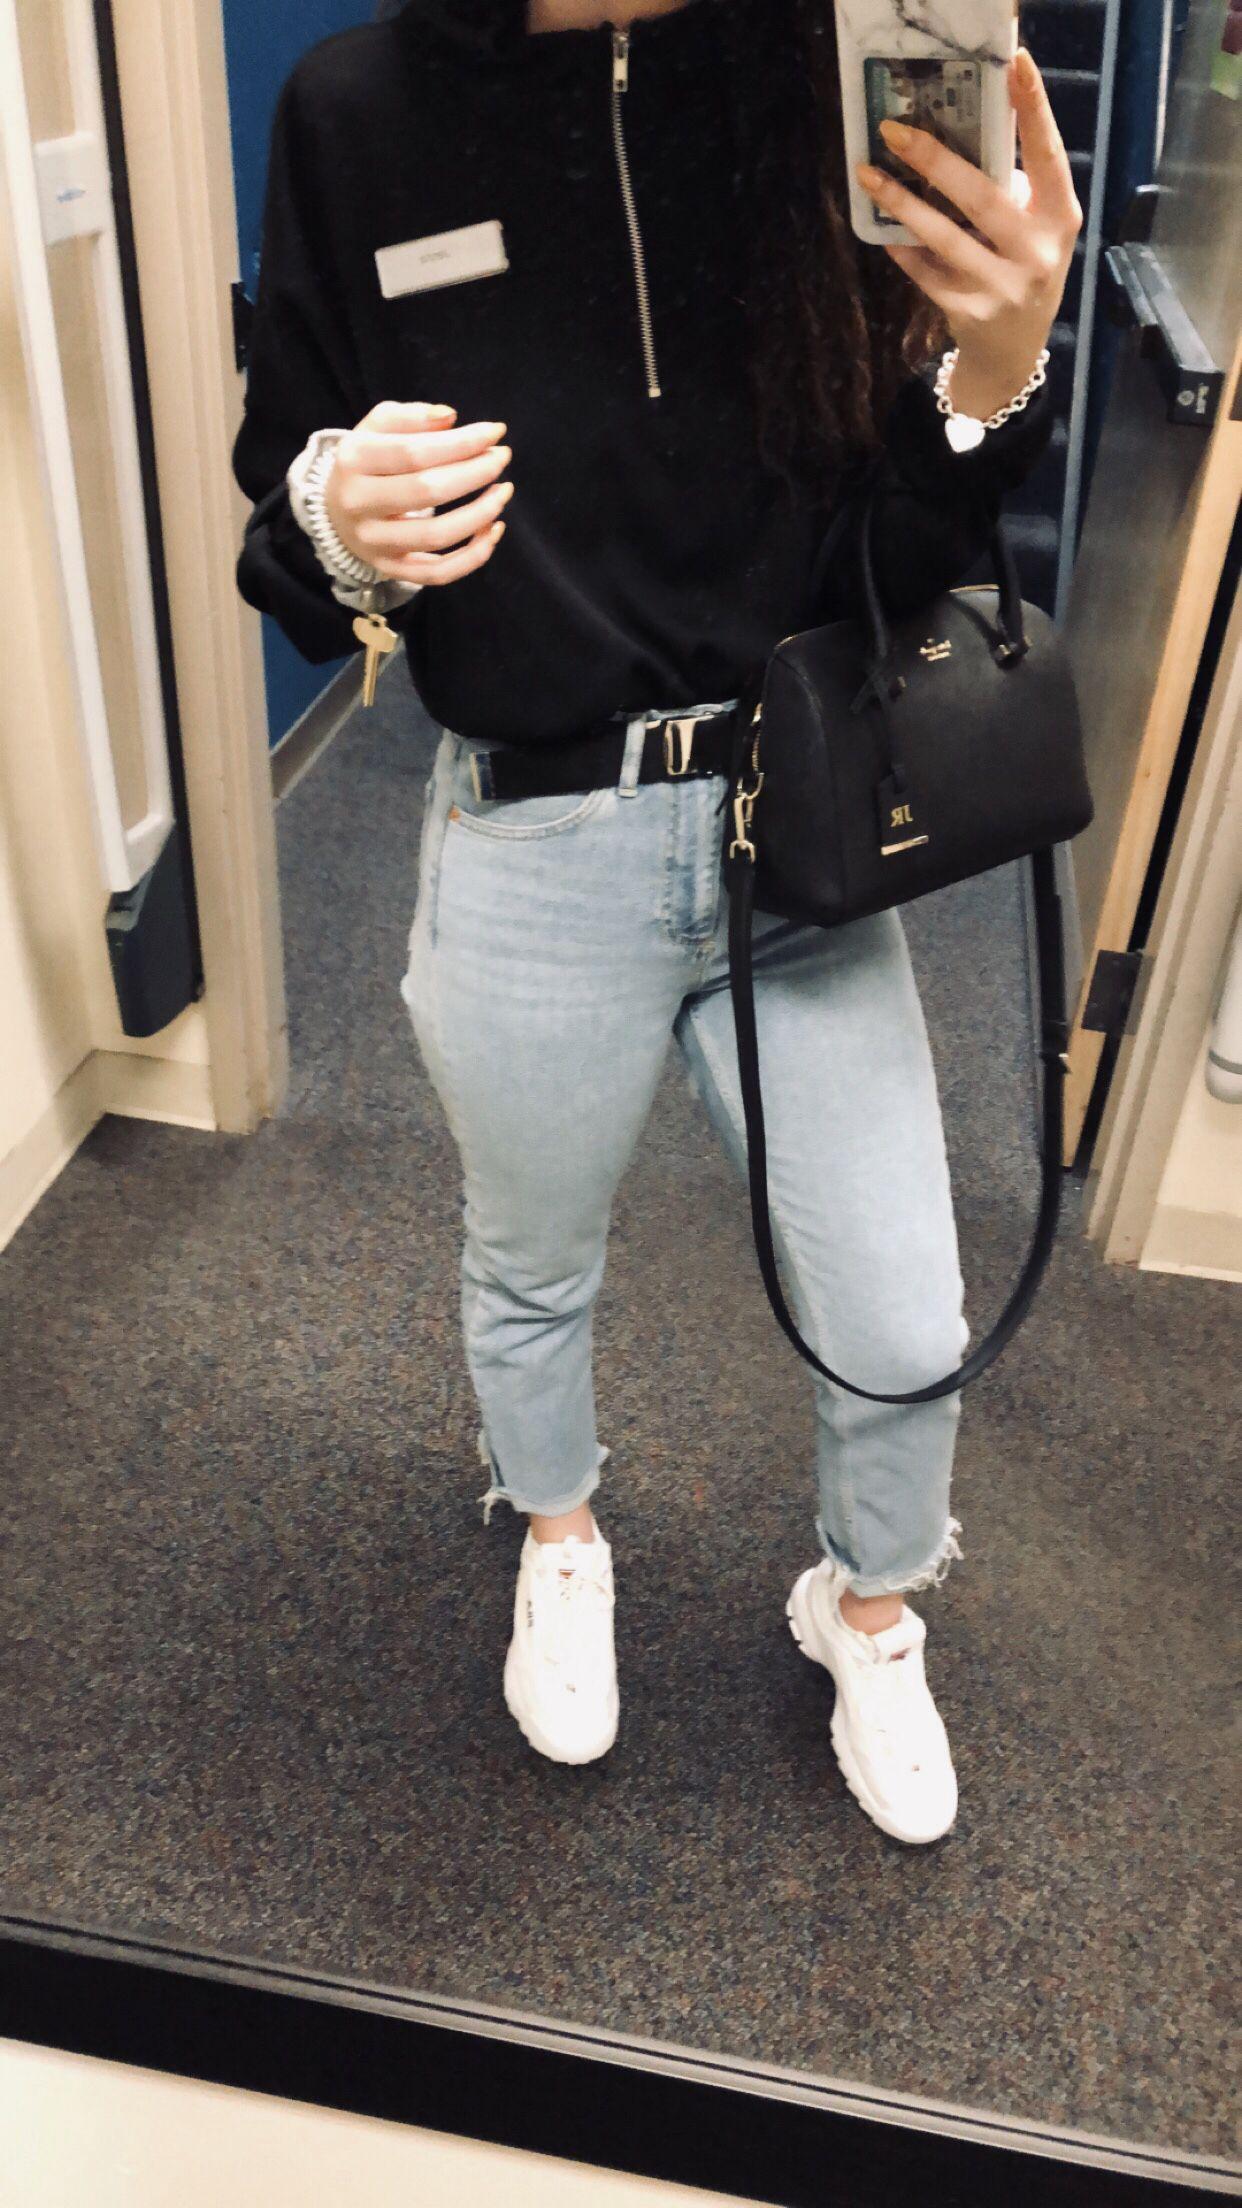 16f3464f2ca •Black Pretty Little Thing Quarter ZIP • Topshop Light Wash Straight leg  Jeans• Brandy Melville Belt• White fila disruptors•